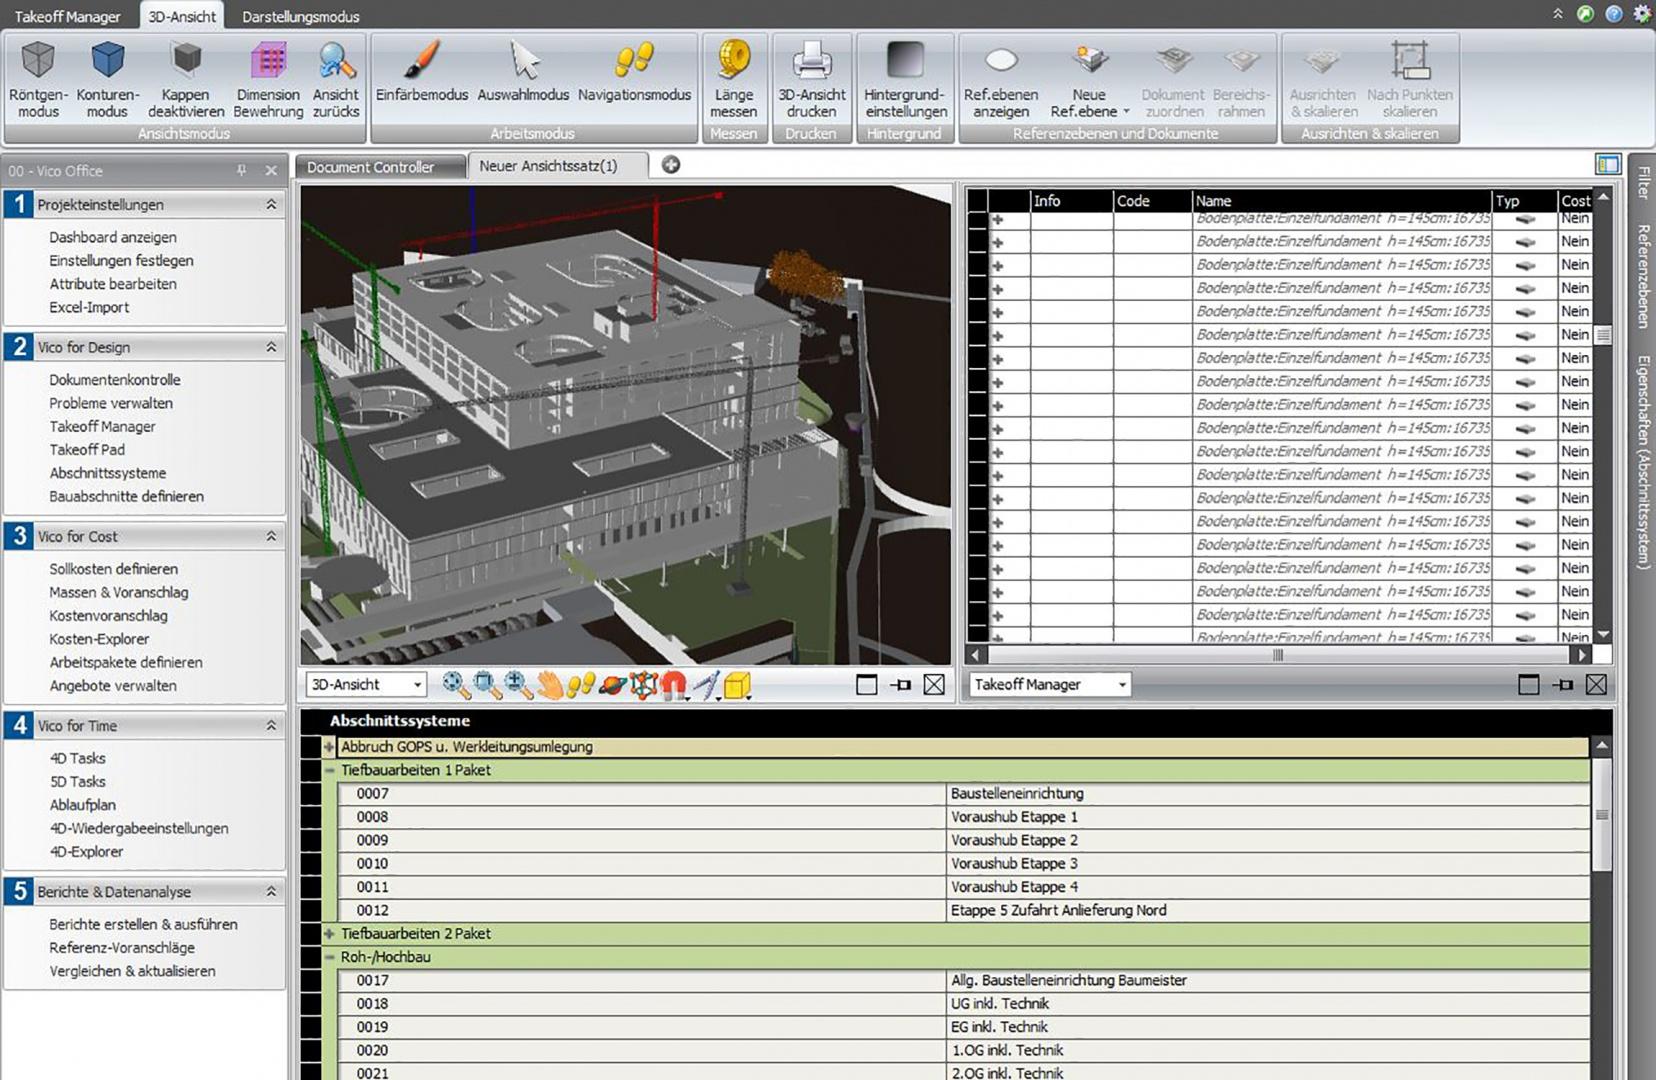 Vico Office Terminablaufplanung  - Bauabschnitte © Confirm AG